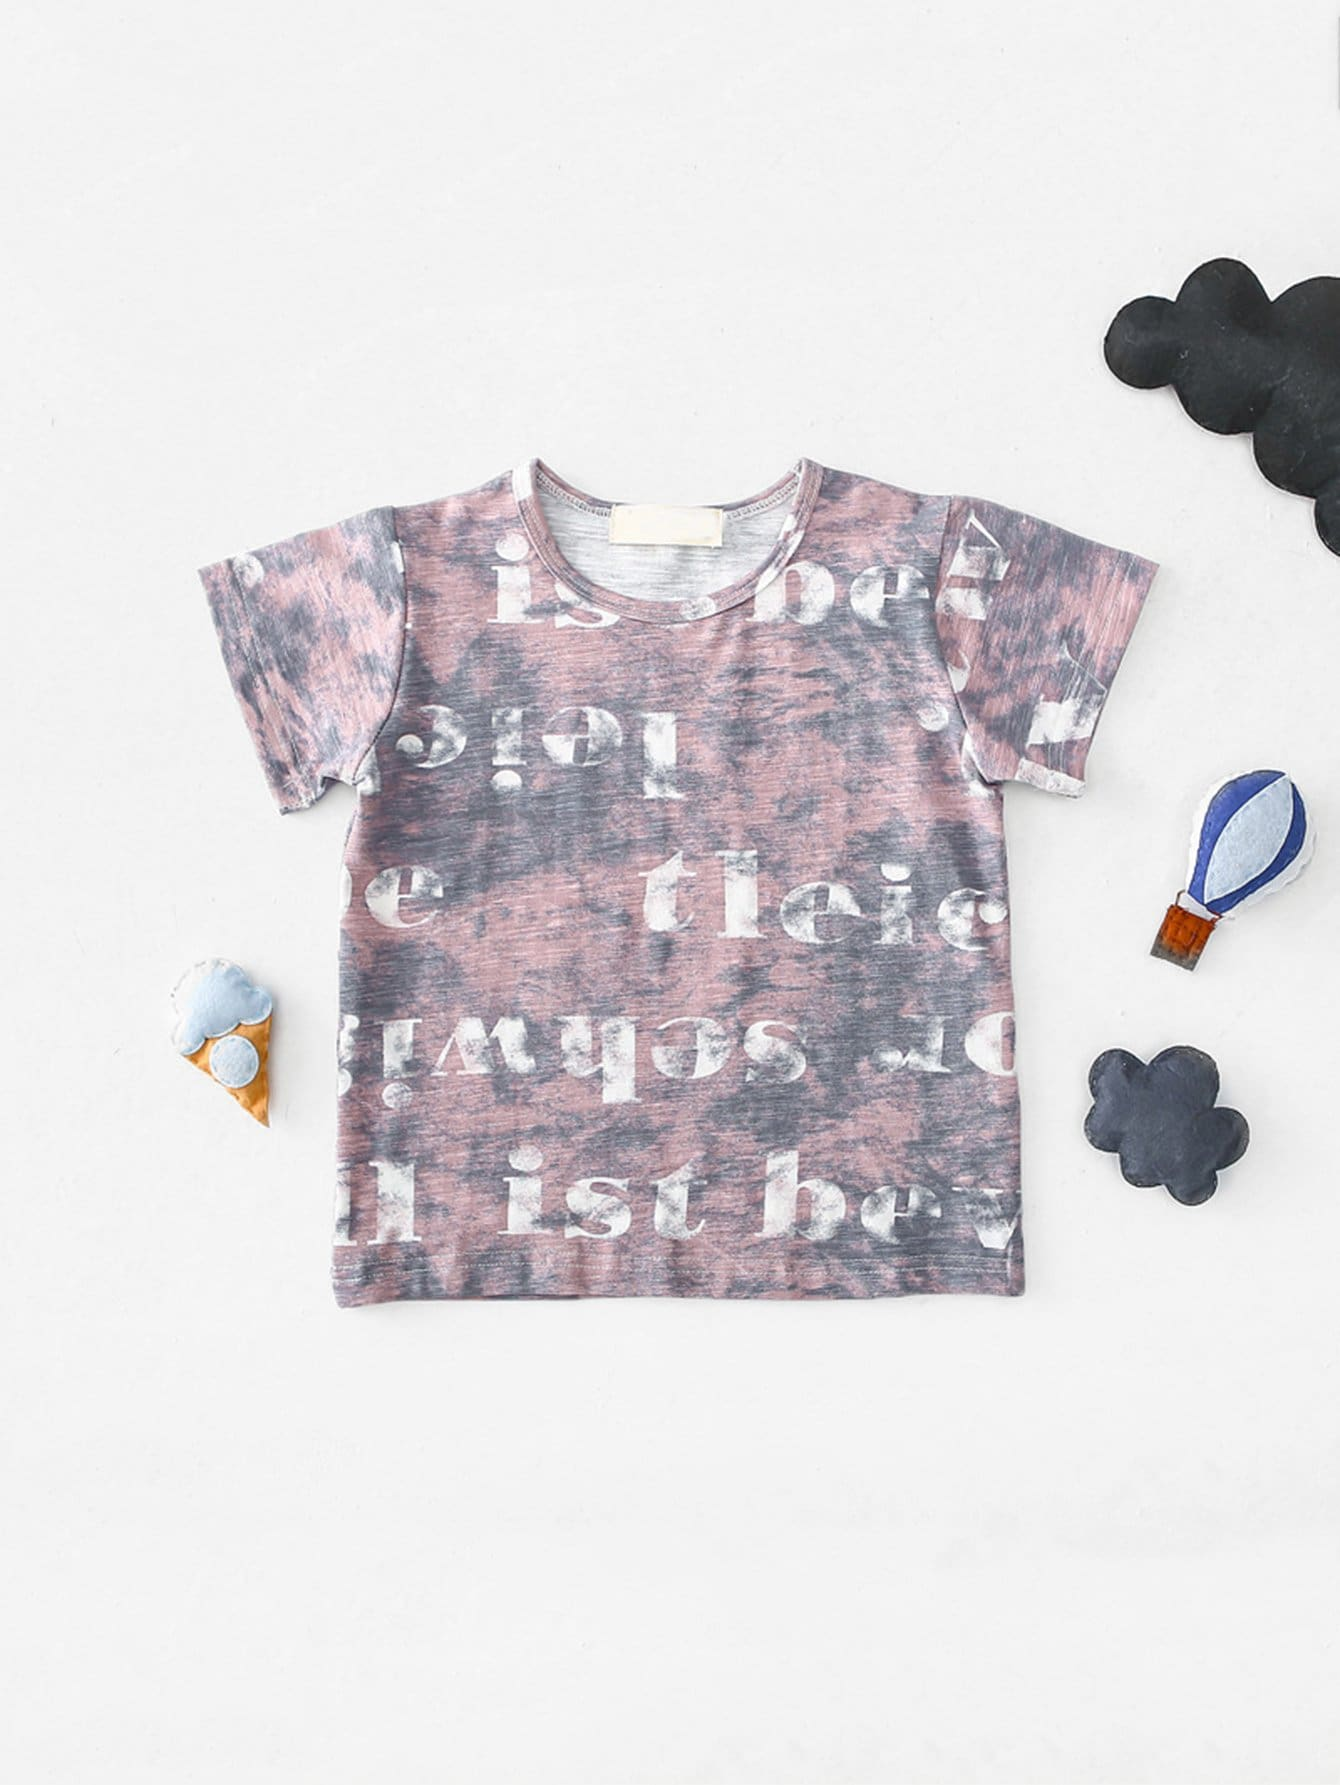 Girls Letter Print Tie Dye T-shirt turndown collar tie dye ink painting print shirt